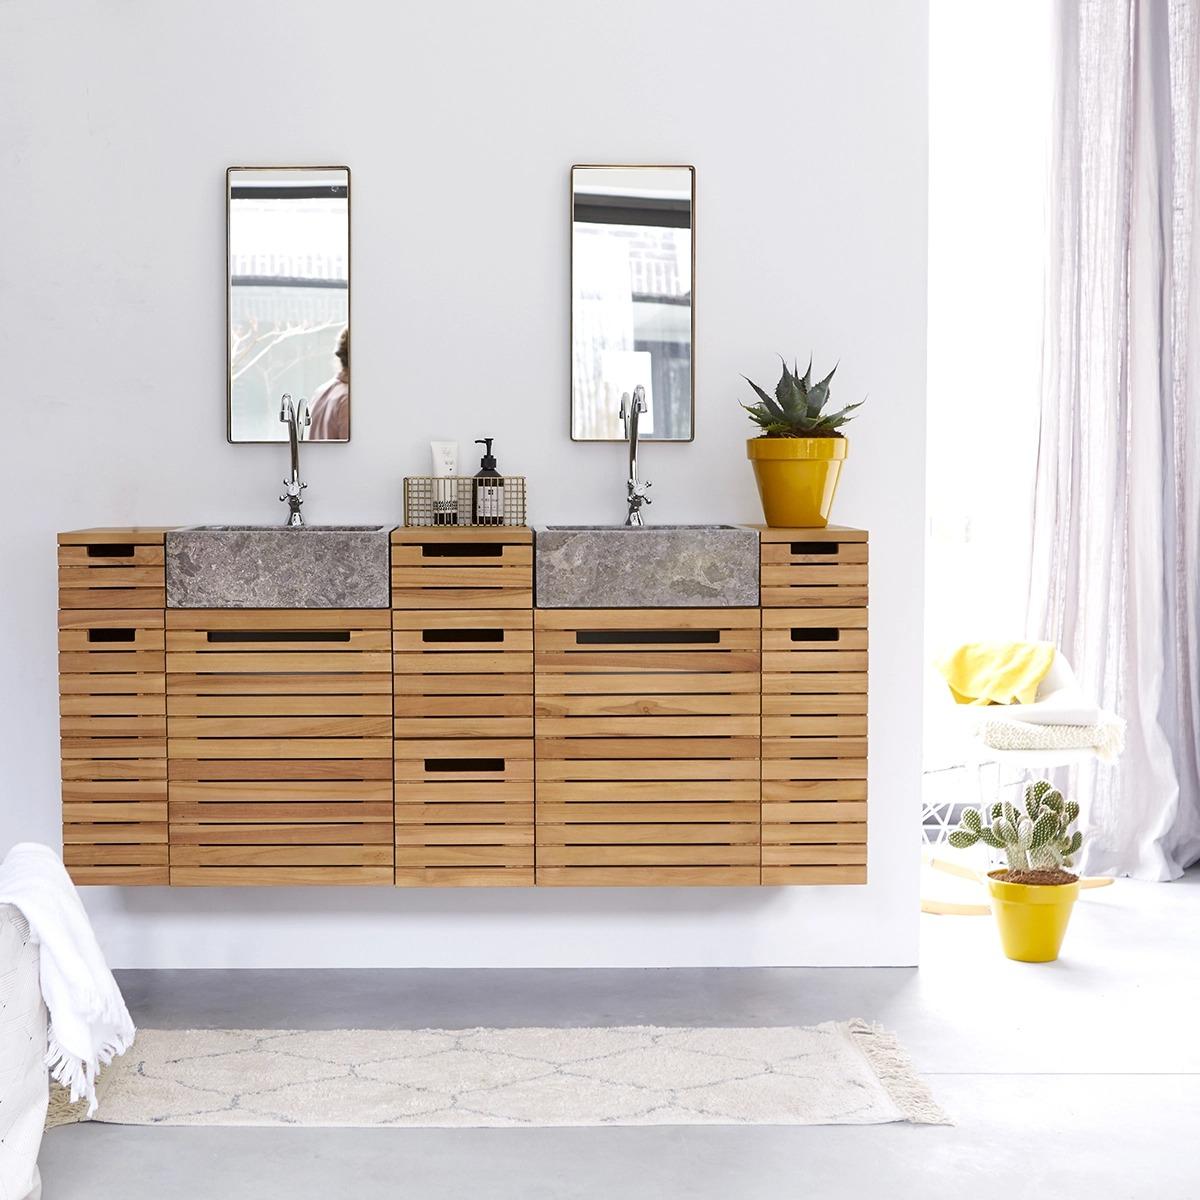 Mueble de baño en teca maciza con lavabo de mármol 150 Slats